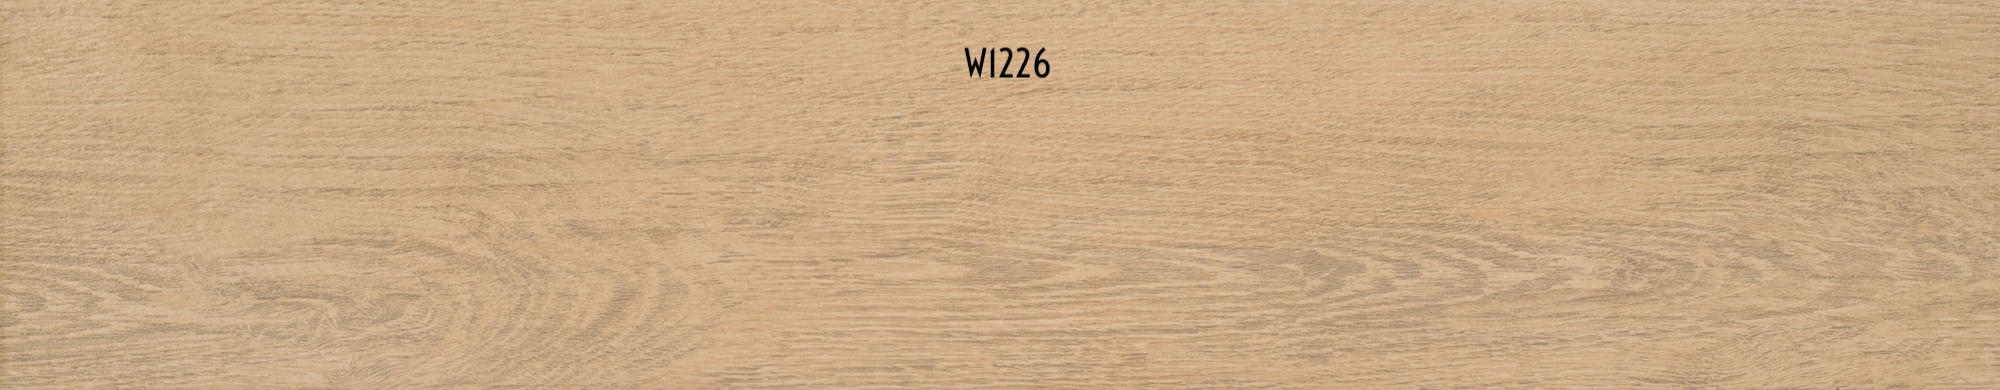 W1226